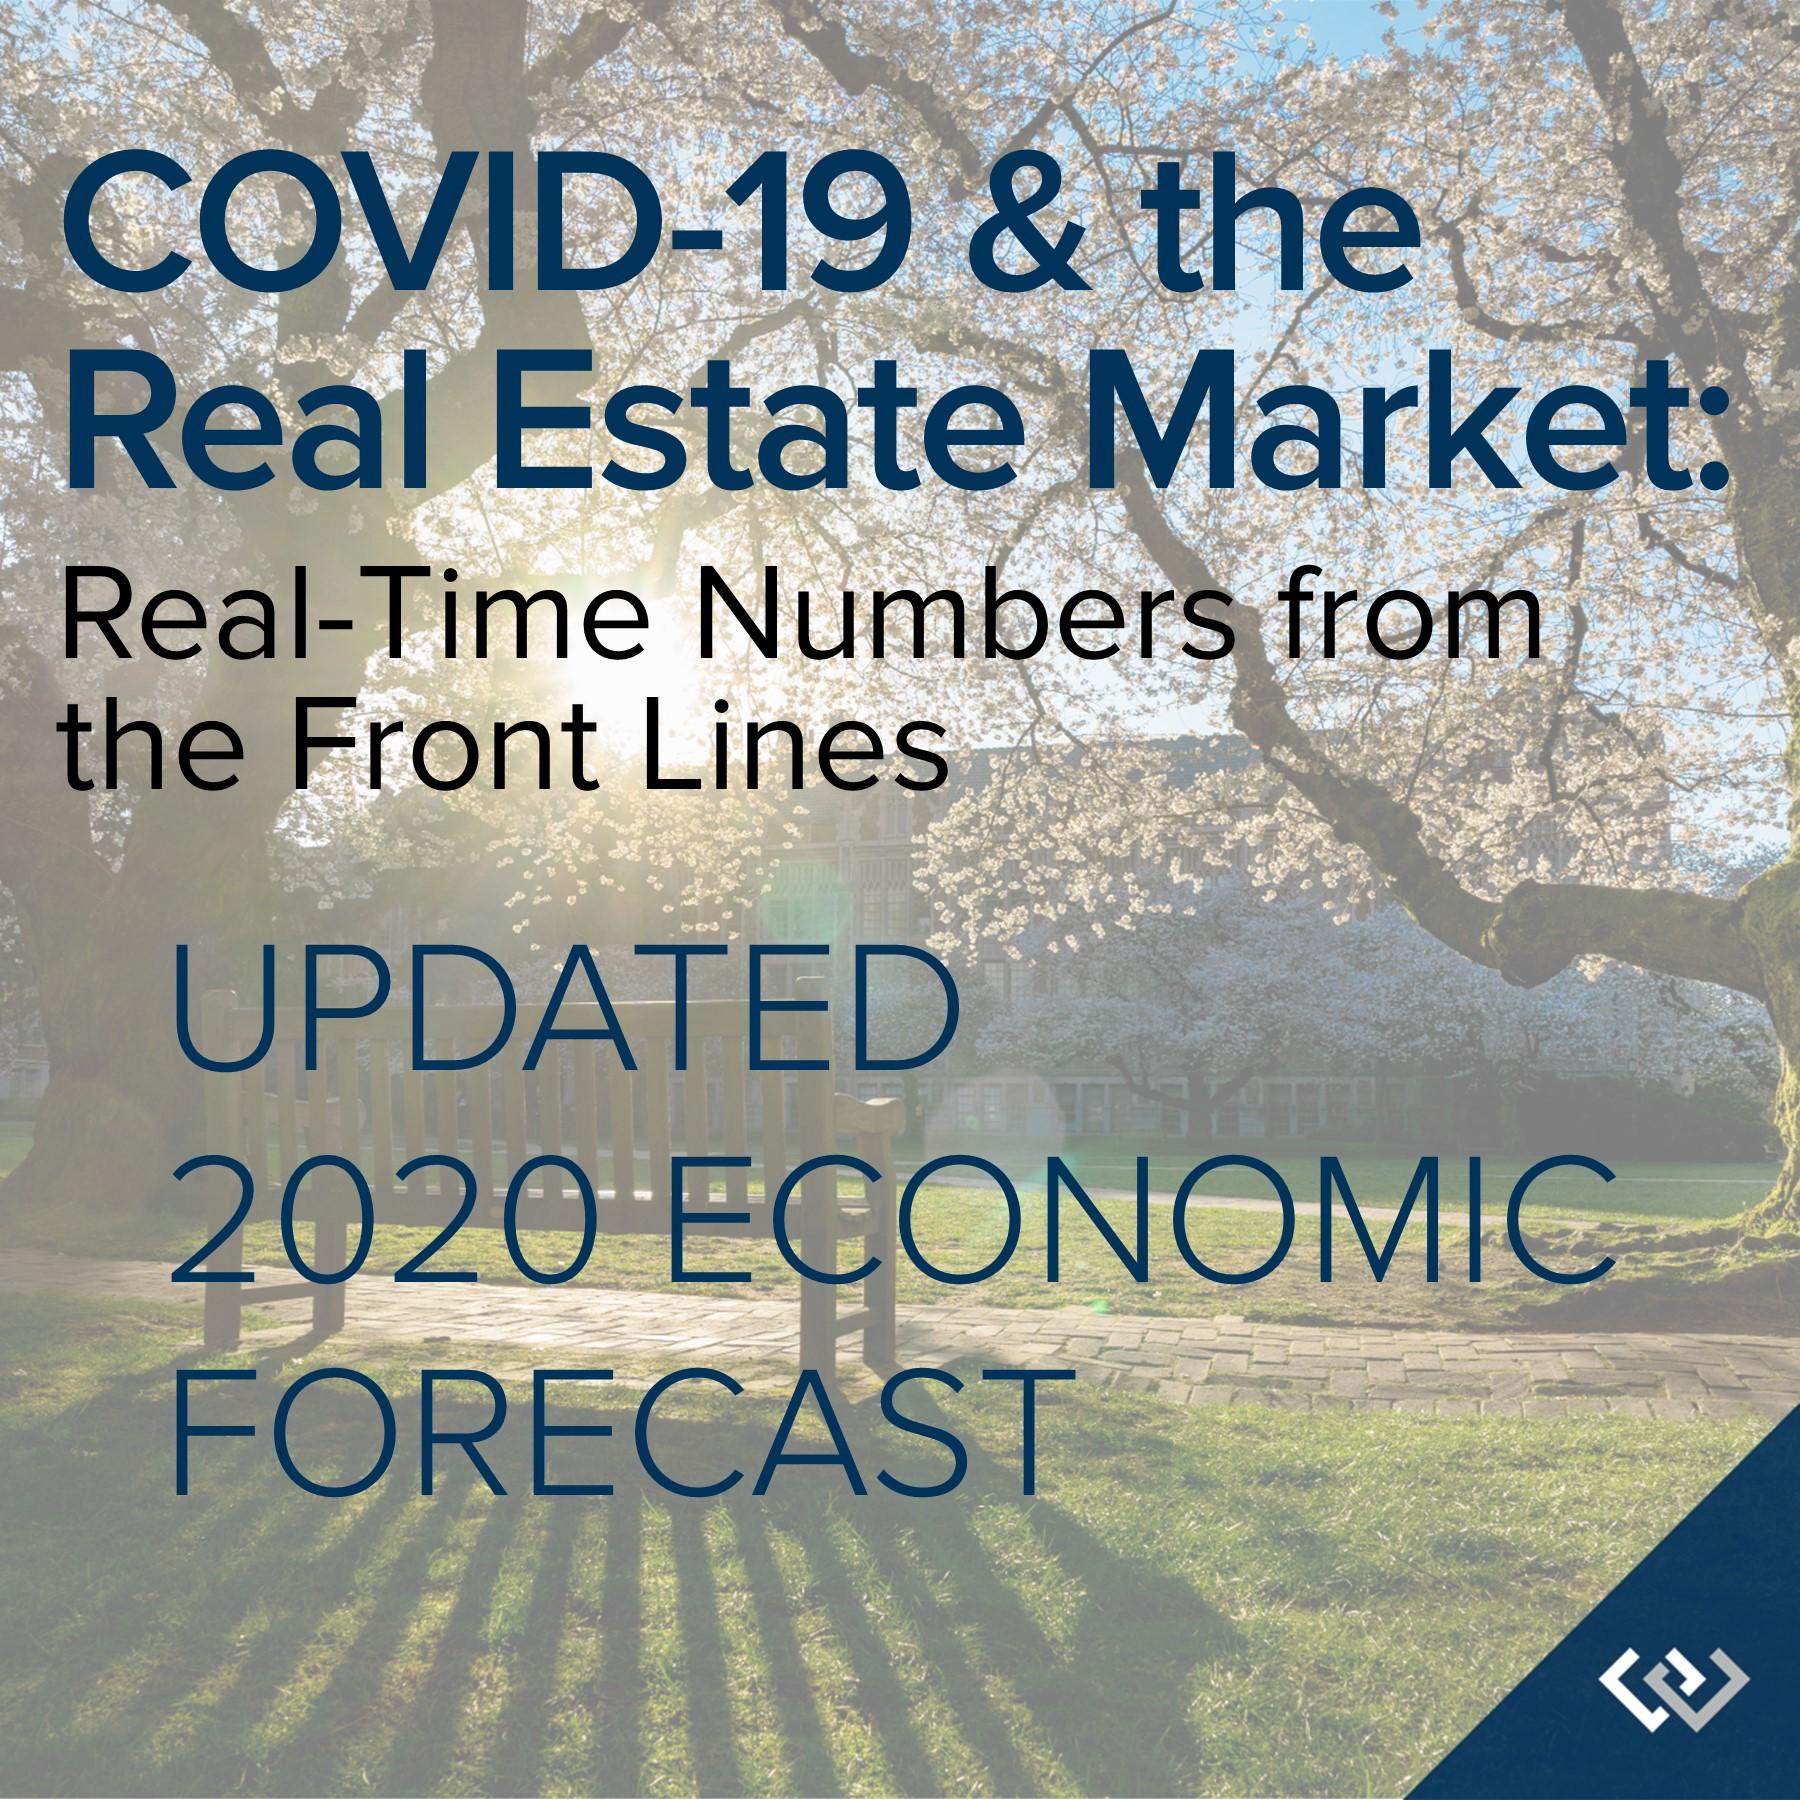 Updated 2020 Forecast